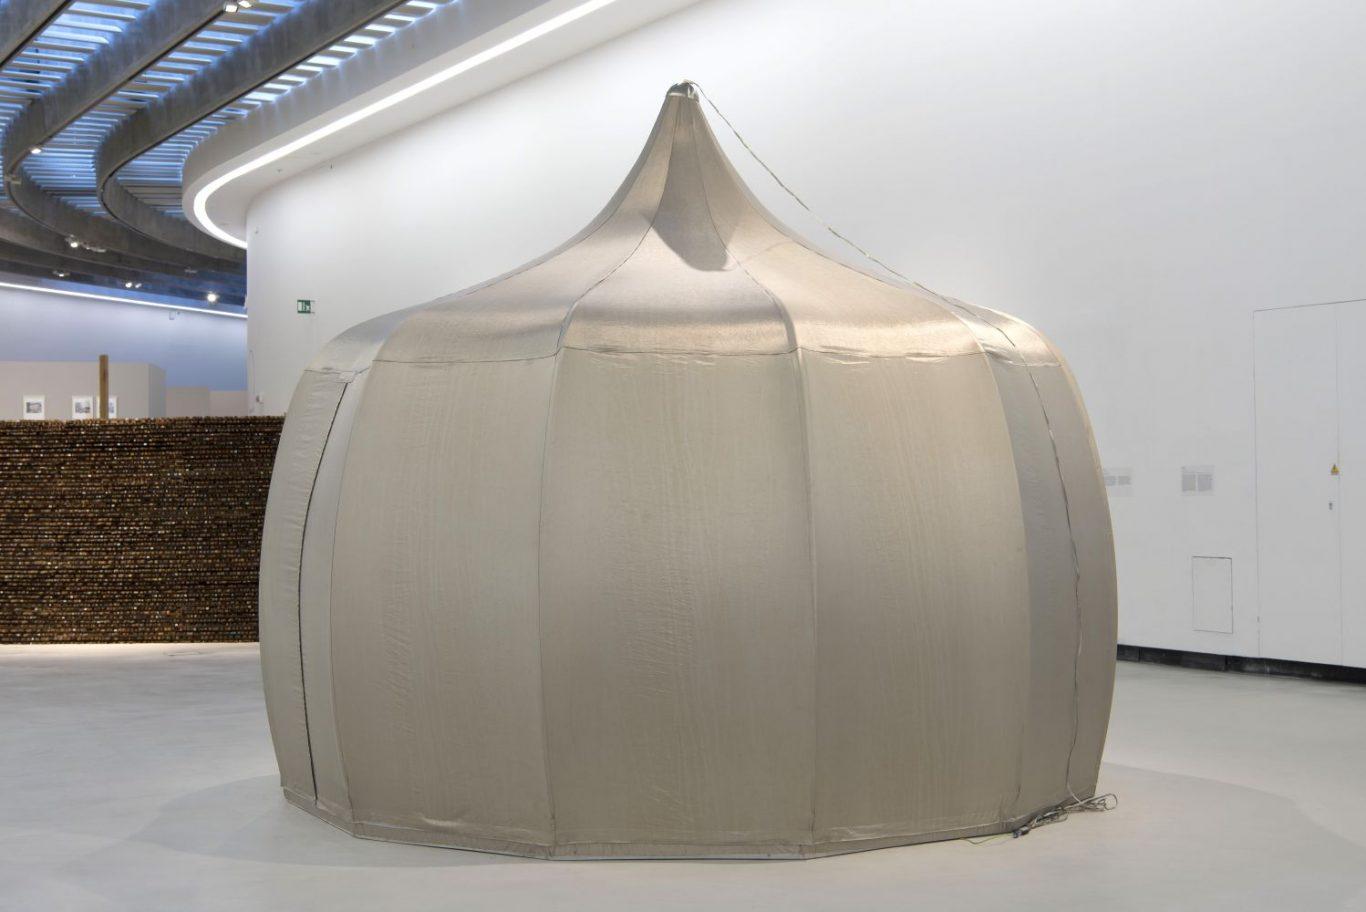 Faradayurt (2001), Jana Sterbak. Fondazione MAXXi